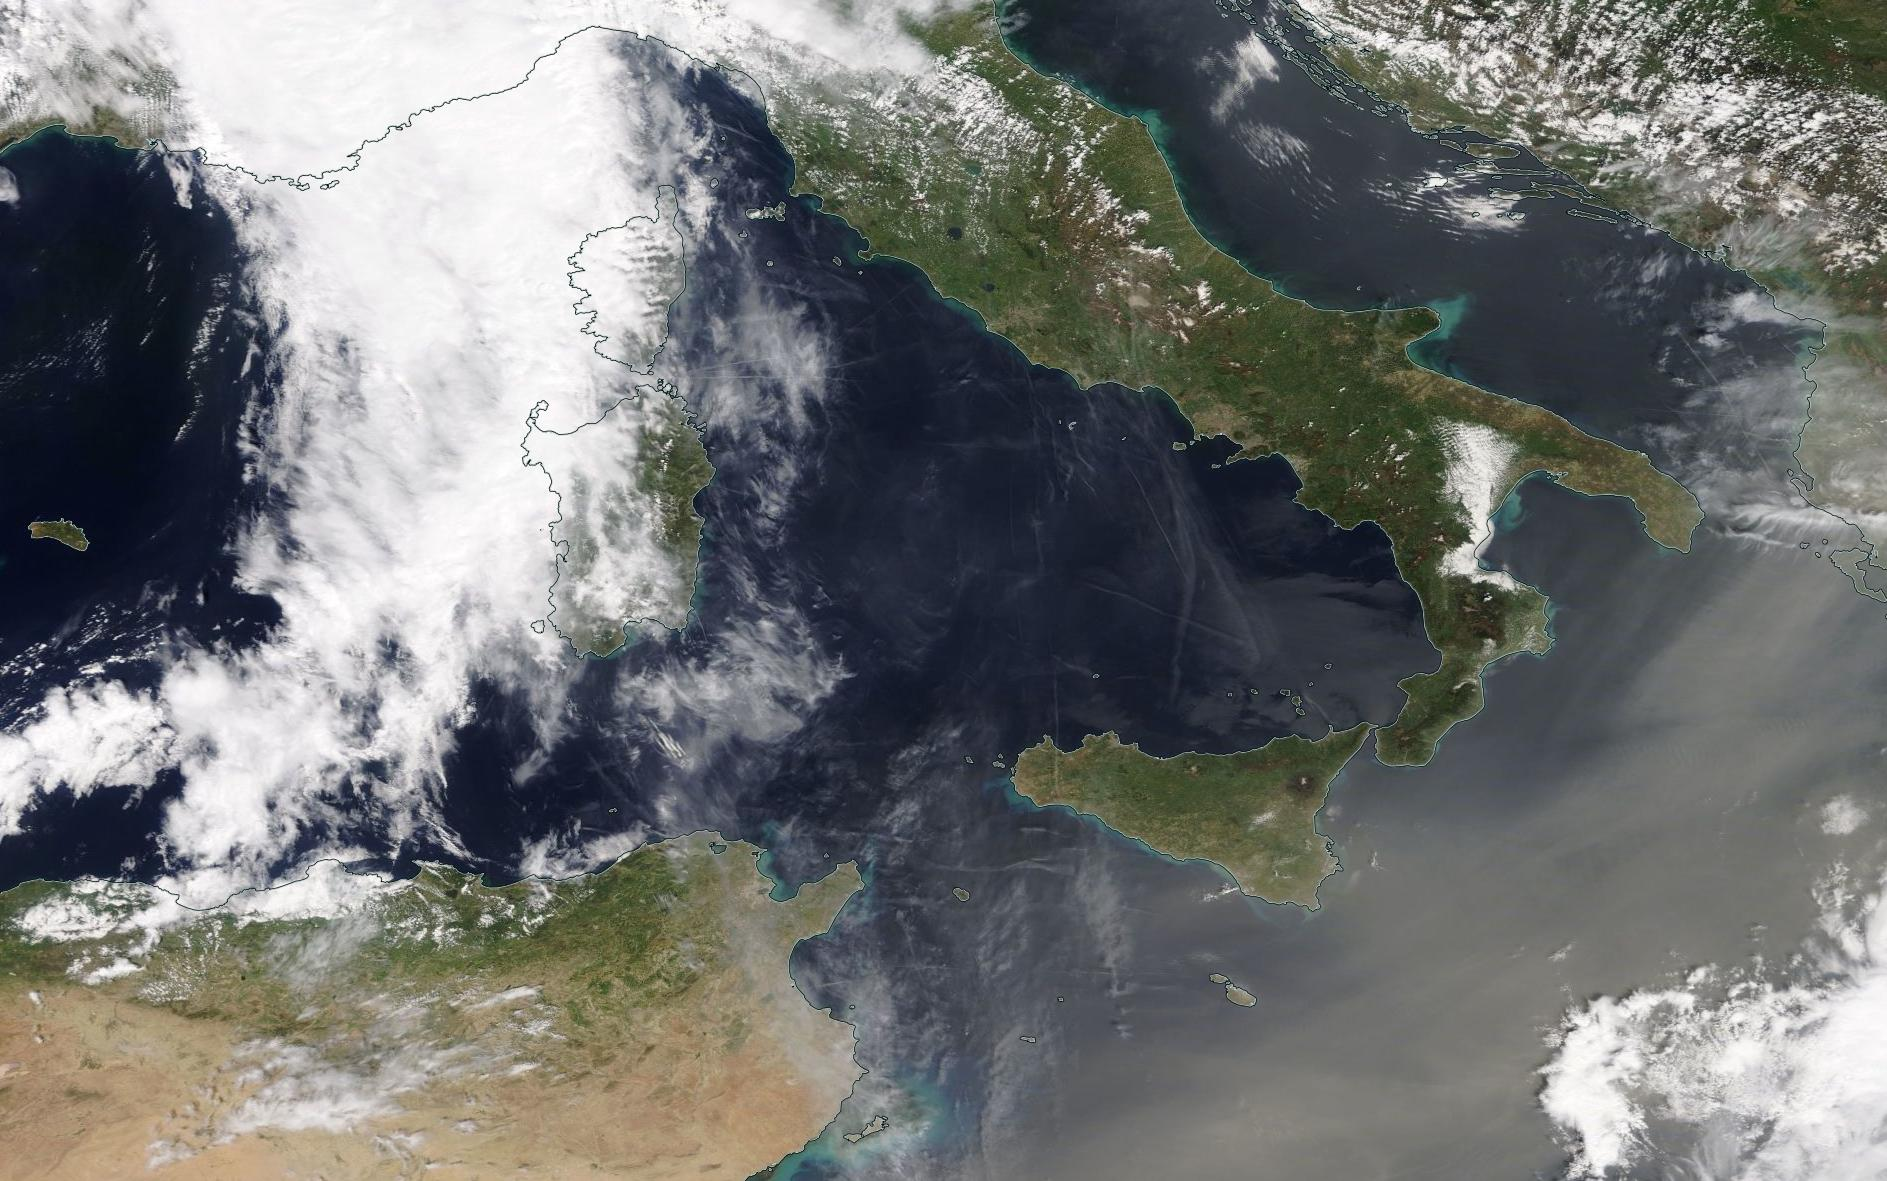 chemtrails Mediterranean 24 April 2019 ... https://go.nasa.gov/2IXyJME